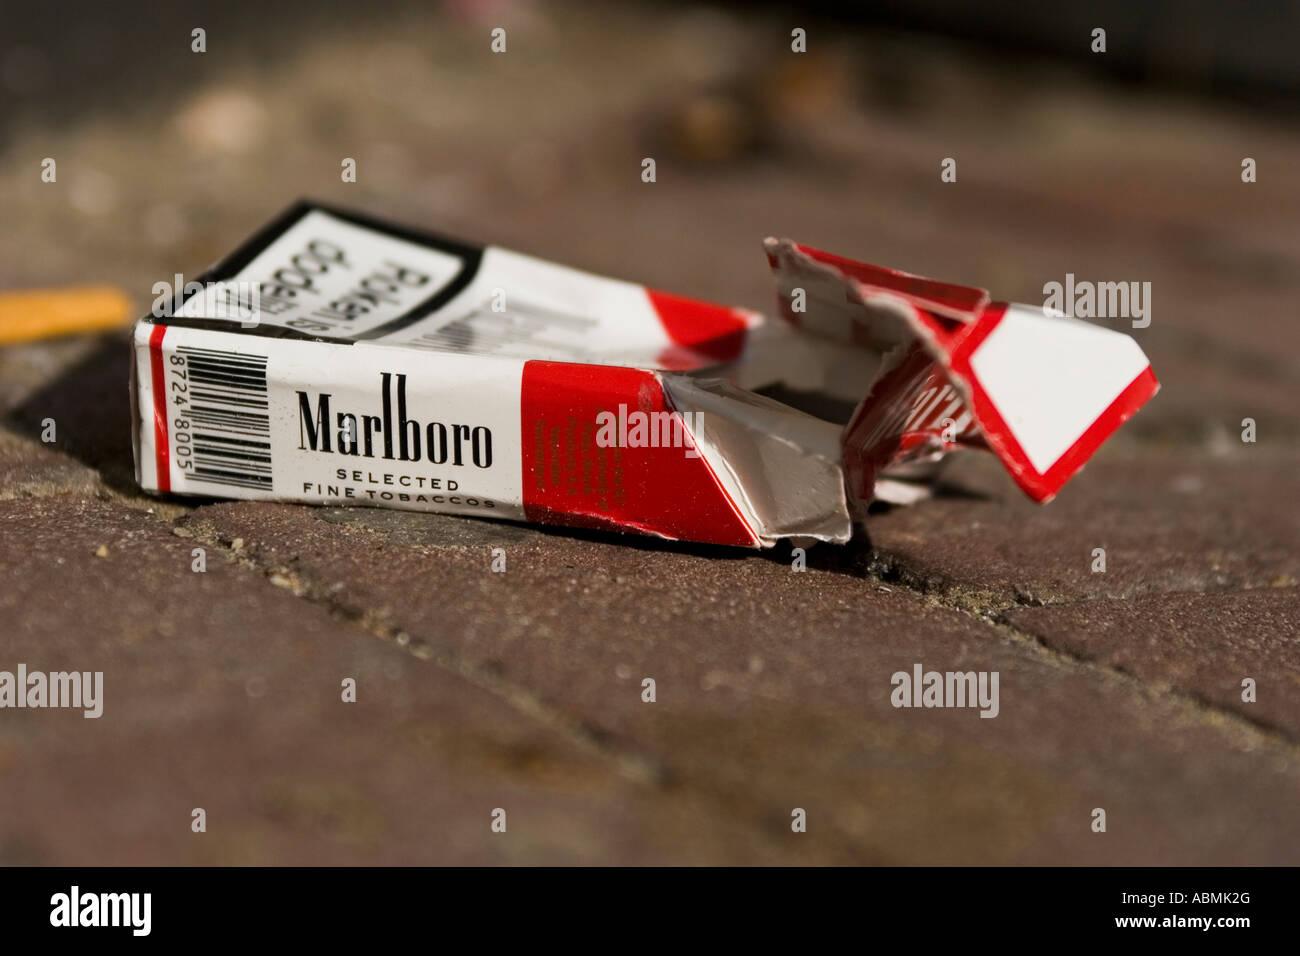 Marlboro cigarettes stores Wisconsin